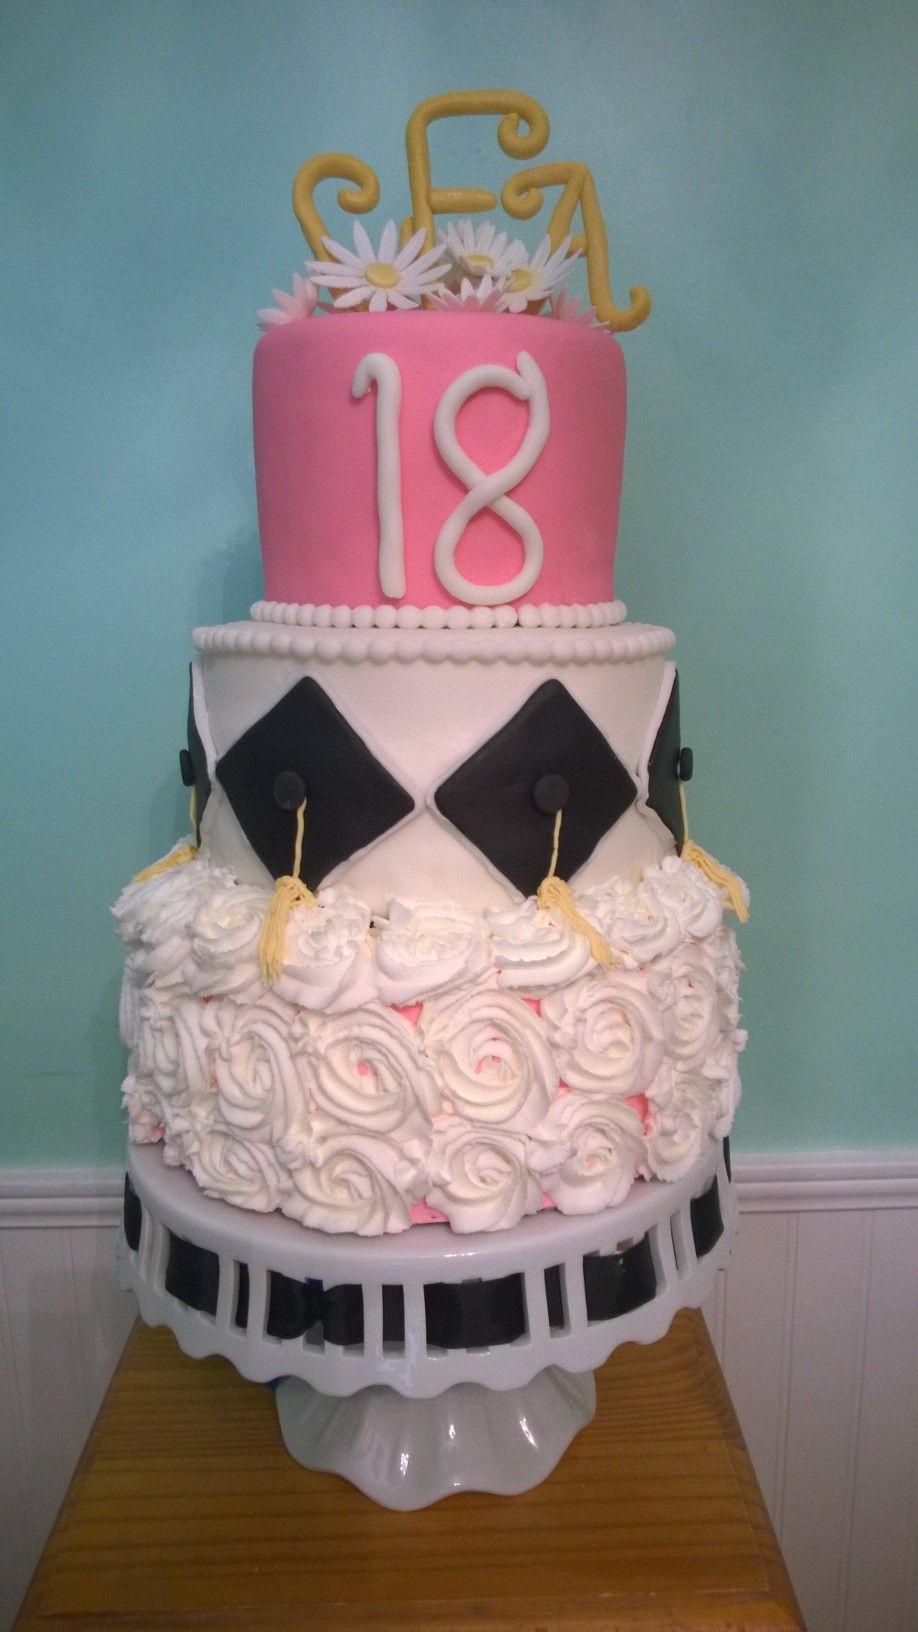 18th Birthdaygraduation Cakes By Me Pinterest Cake